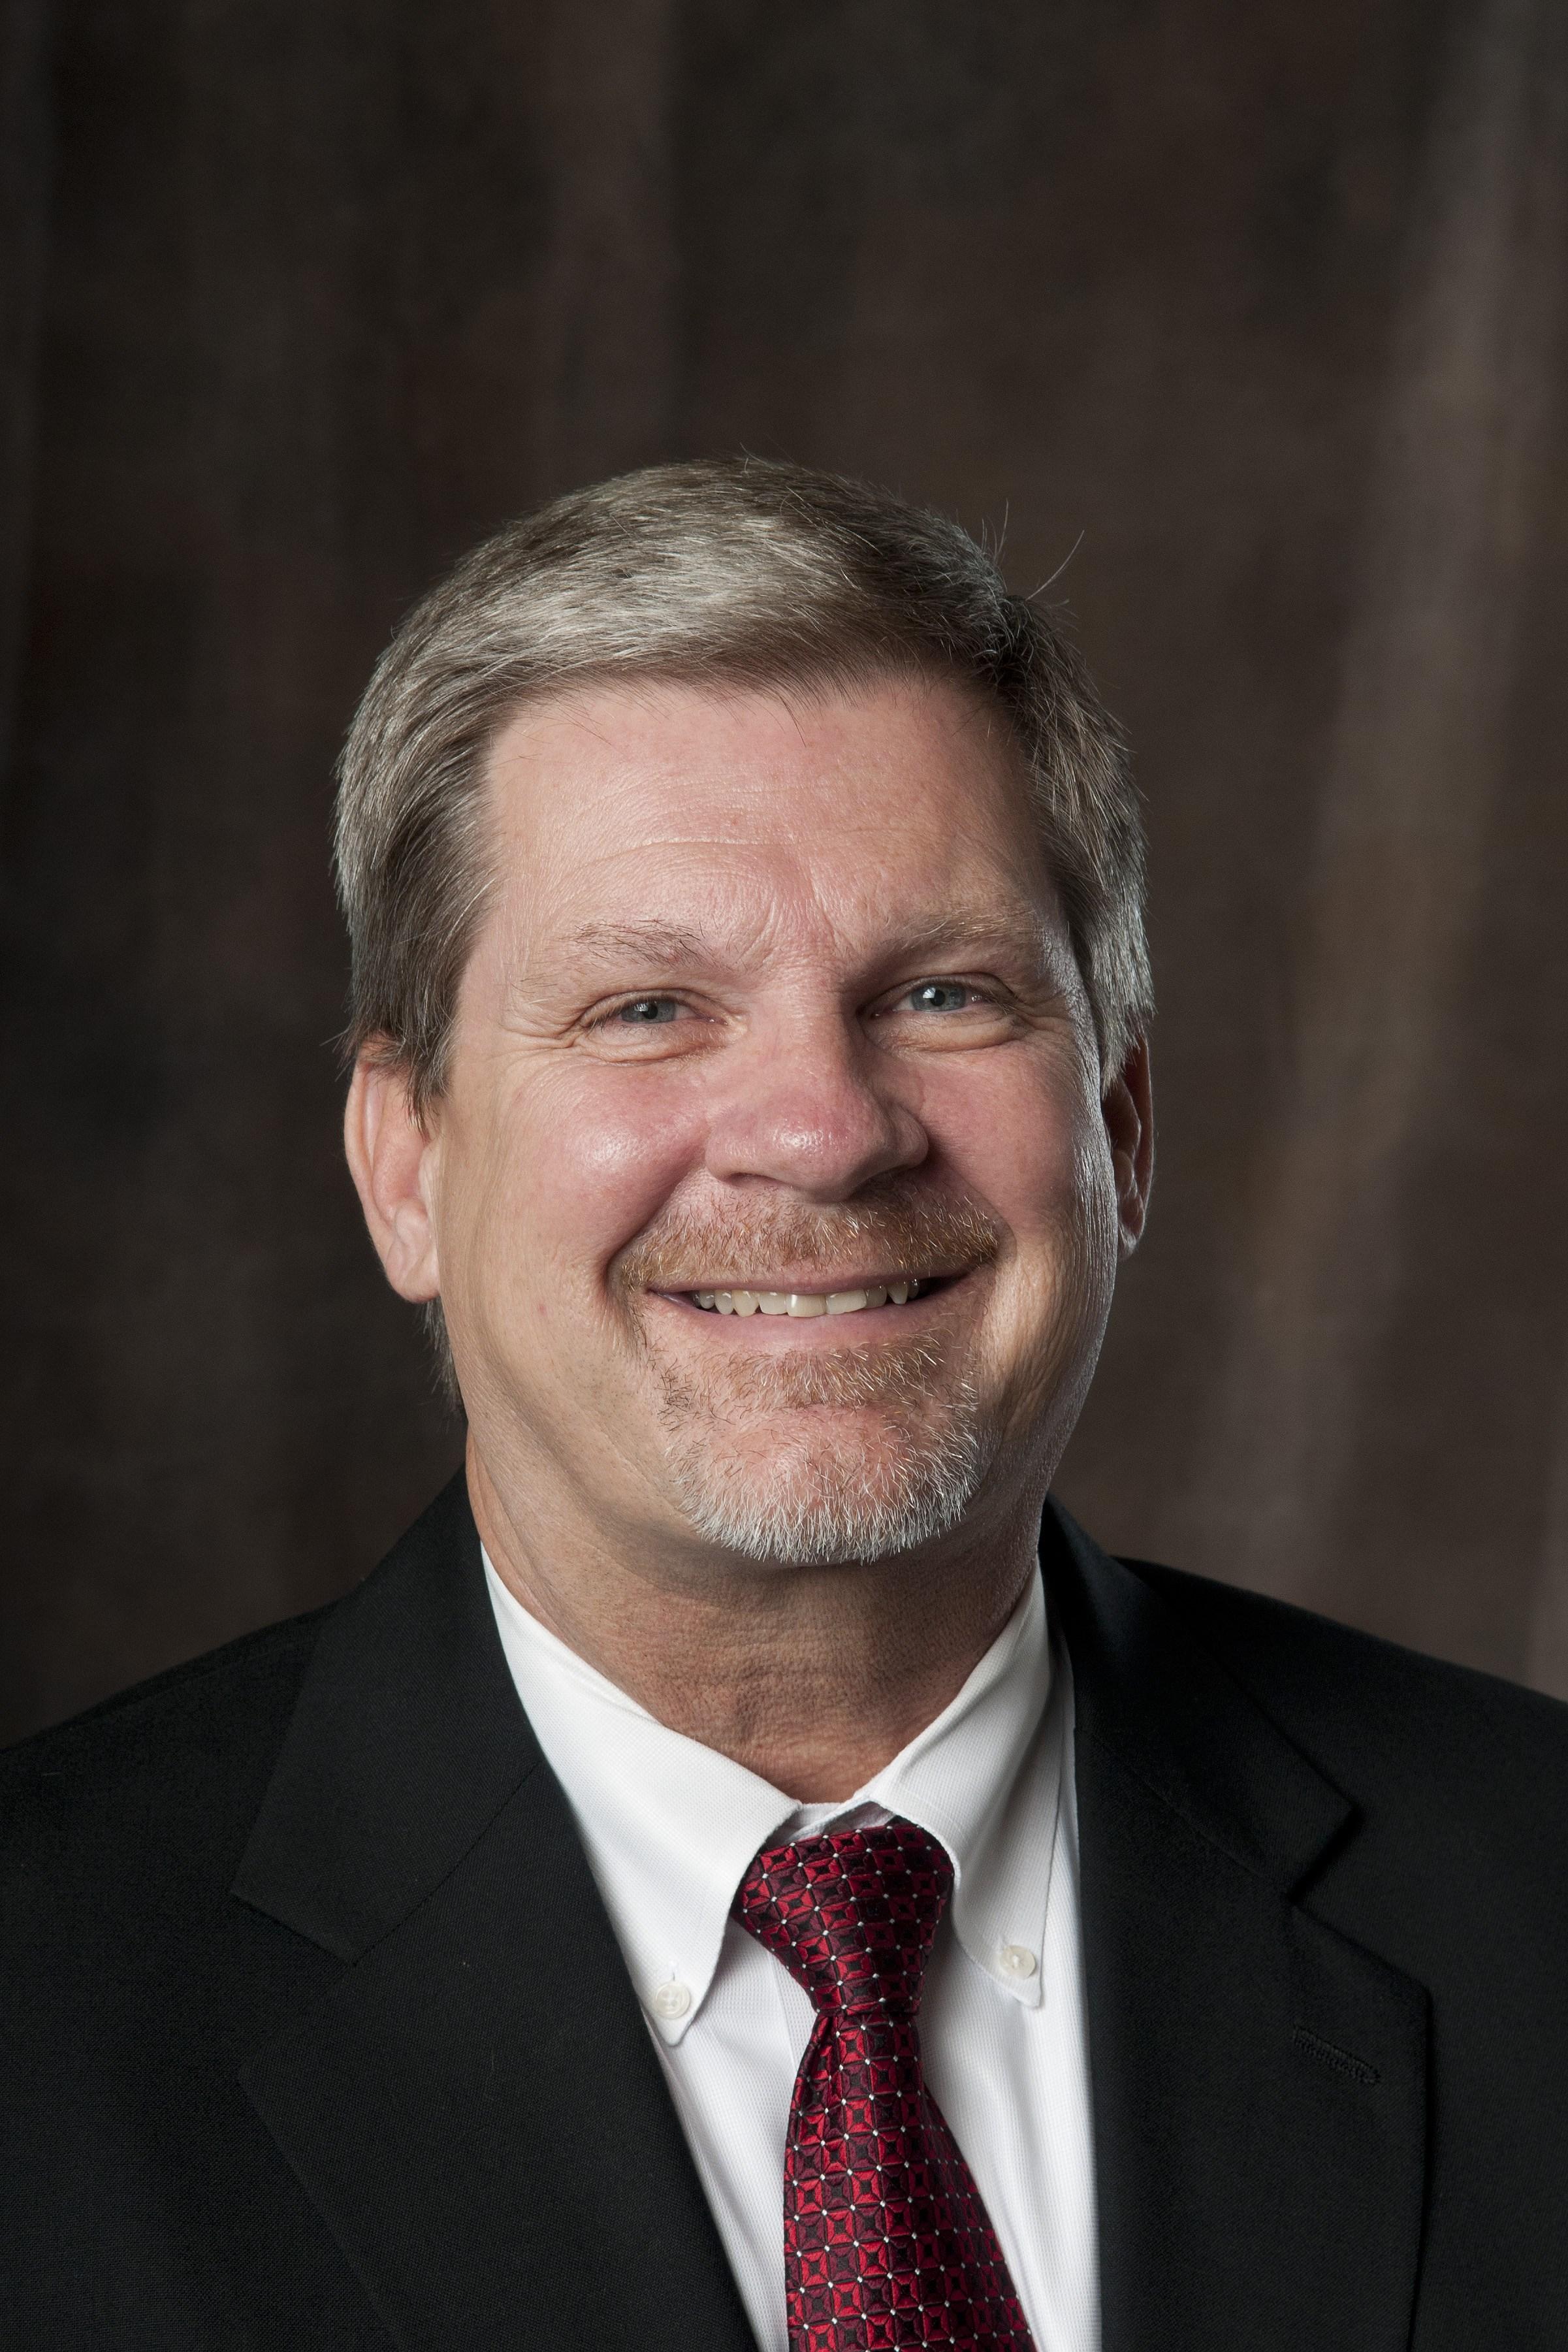 Gary Glover, Principal of Sallas Mahone